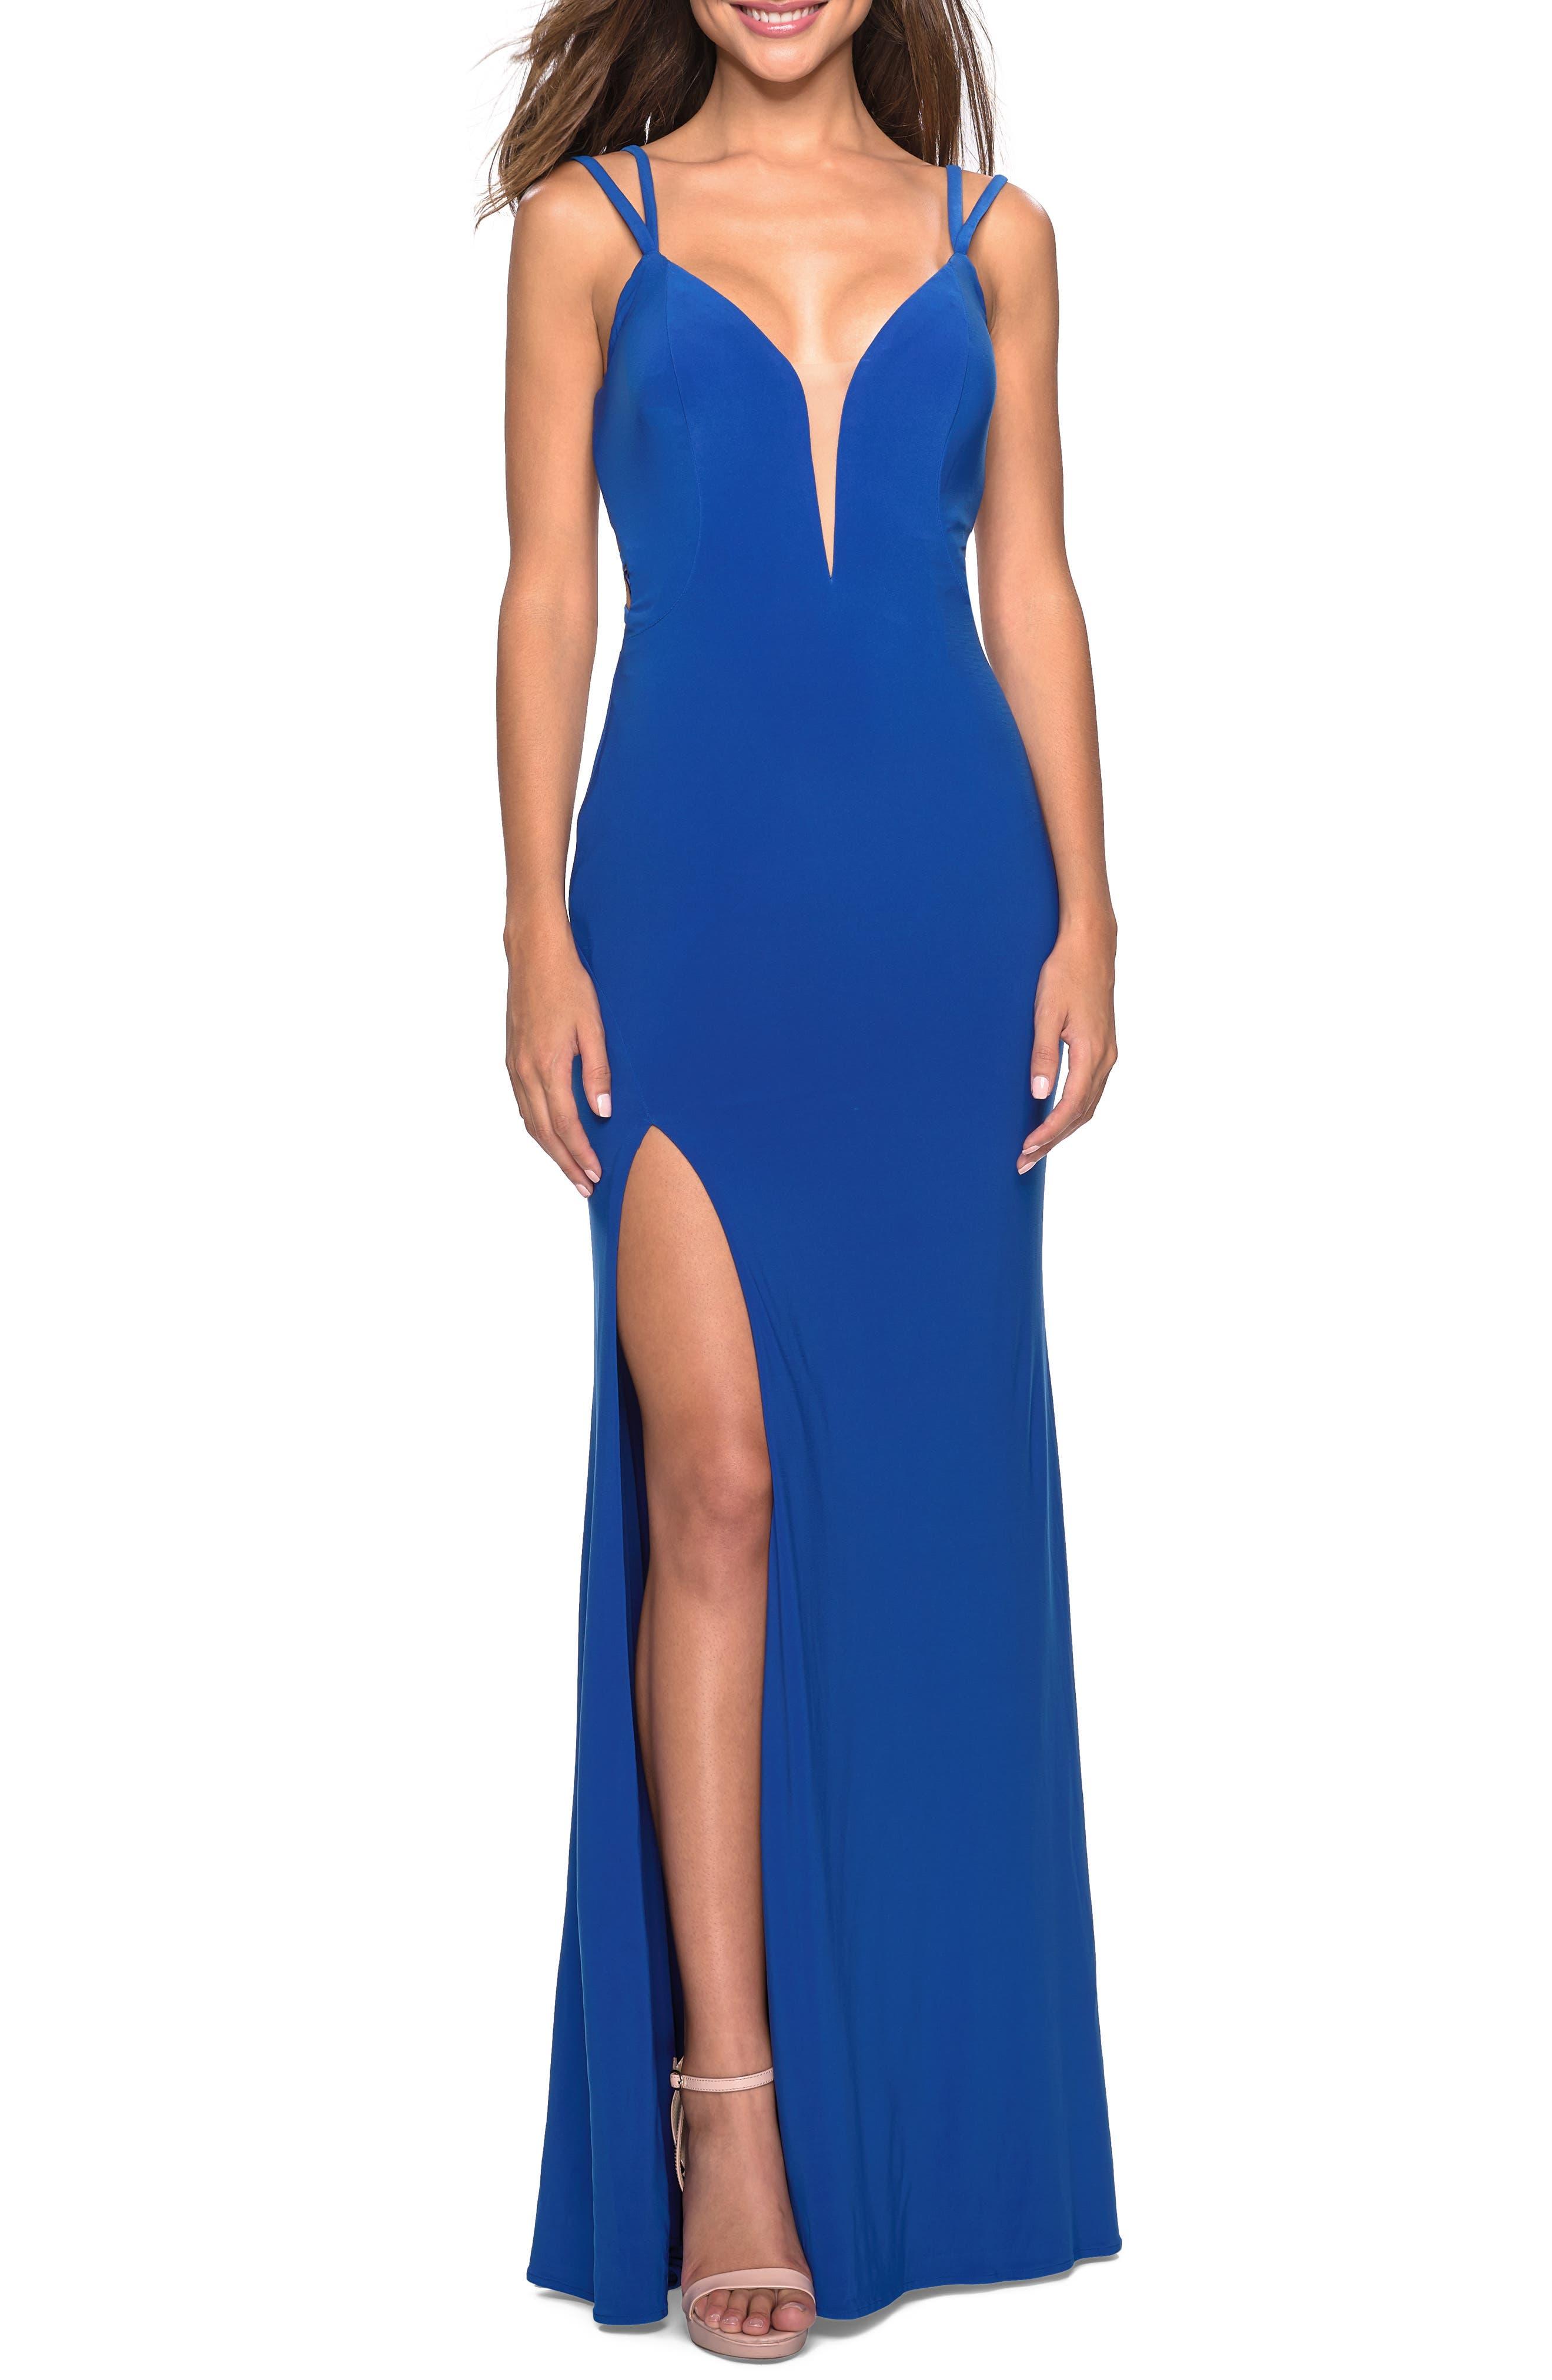 La Femme Strappy Back Fitted Jersey Evening Dress, Blue